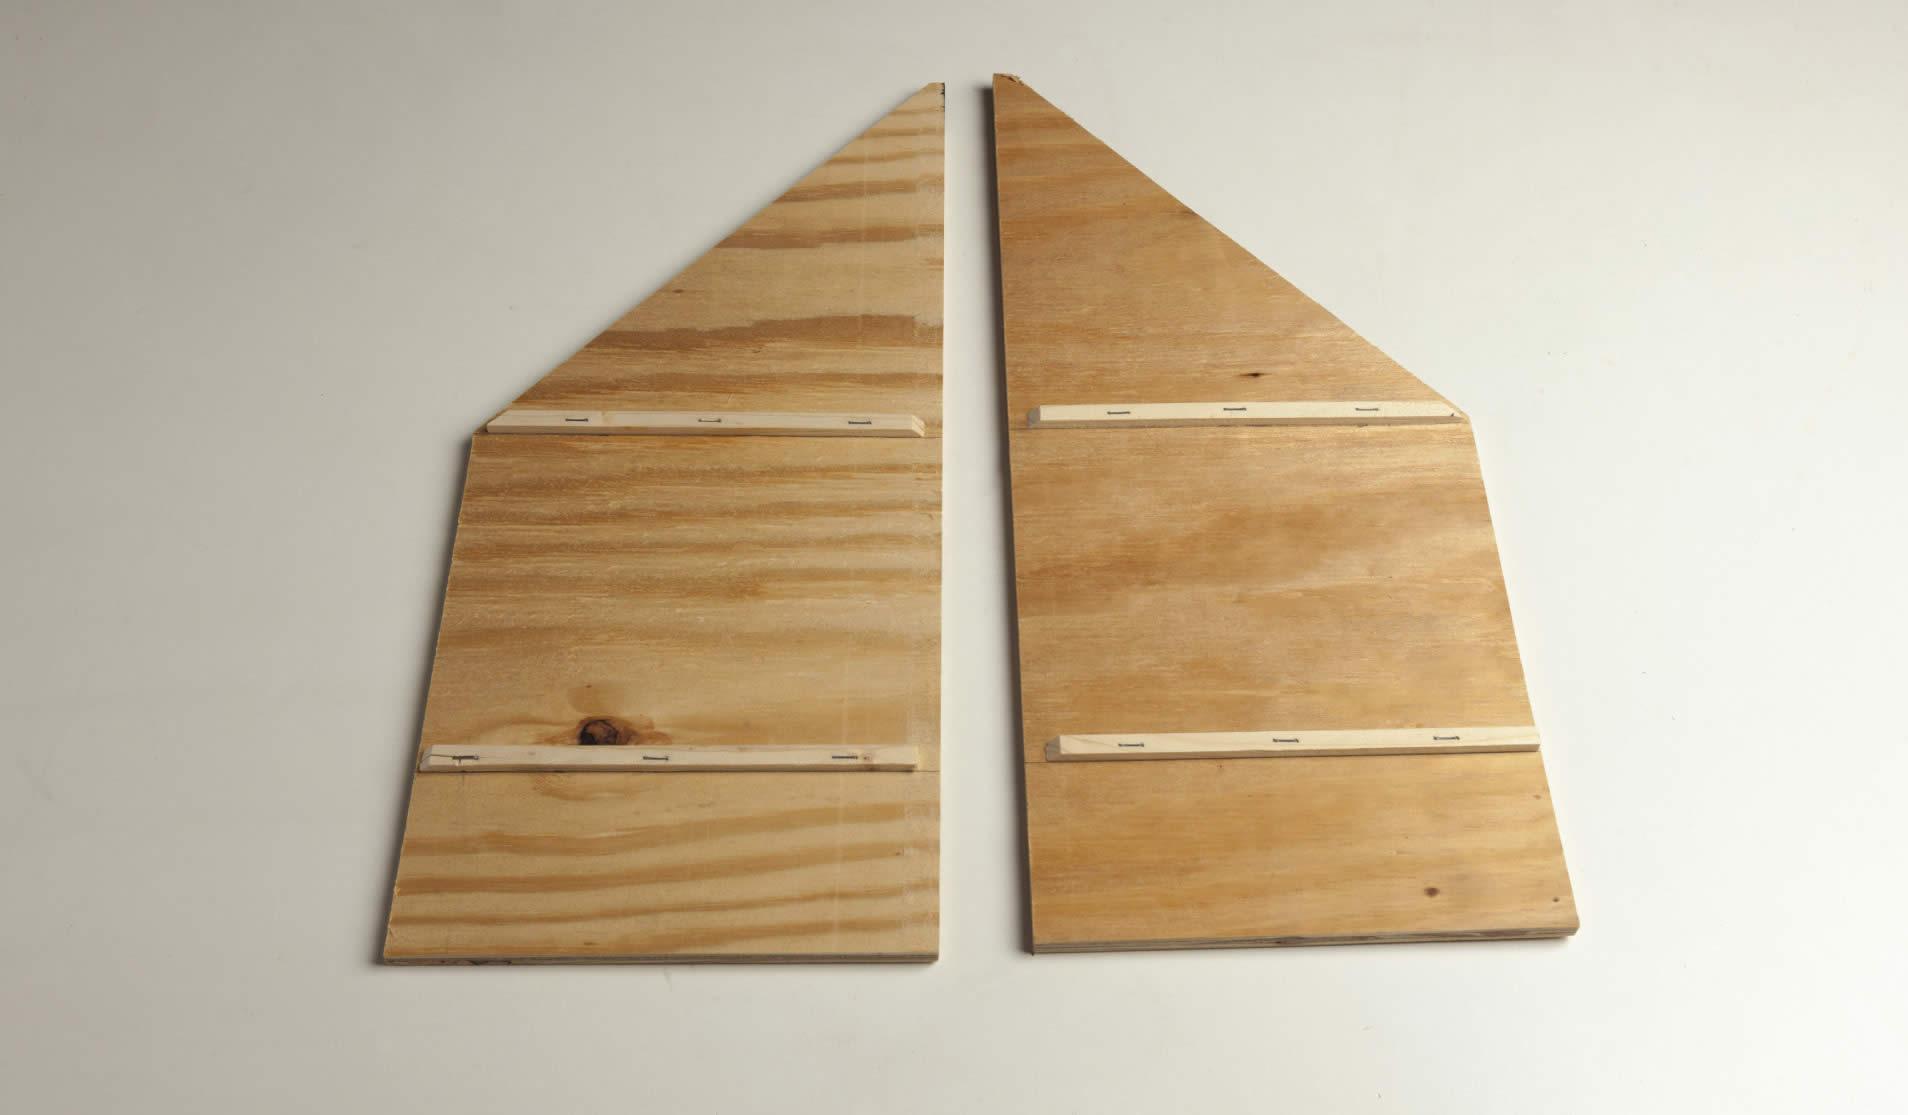 tool-organizer-arrow-project-step1e.jpg